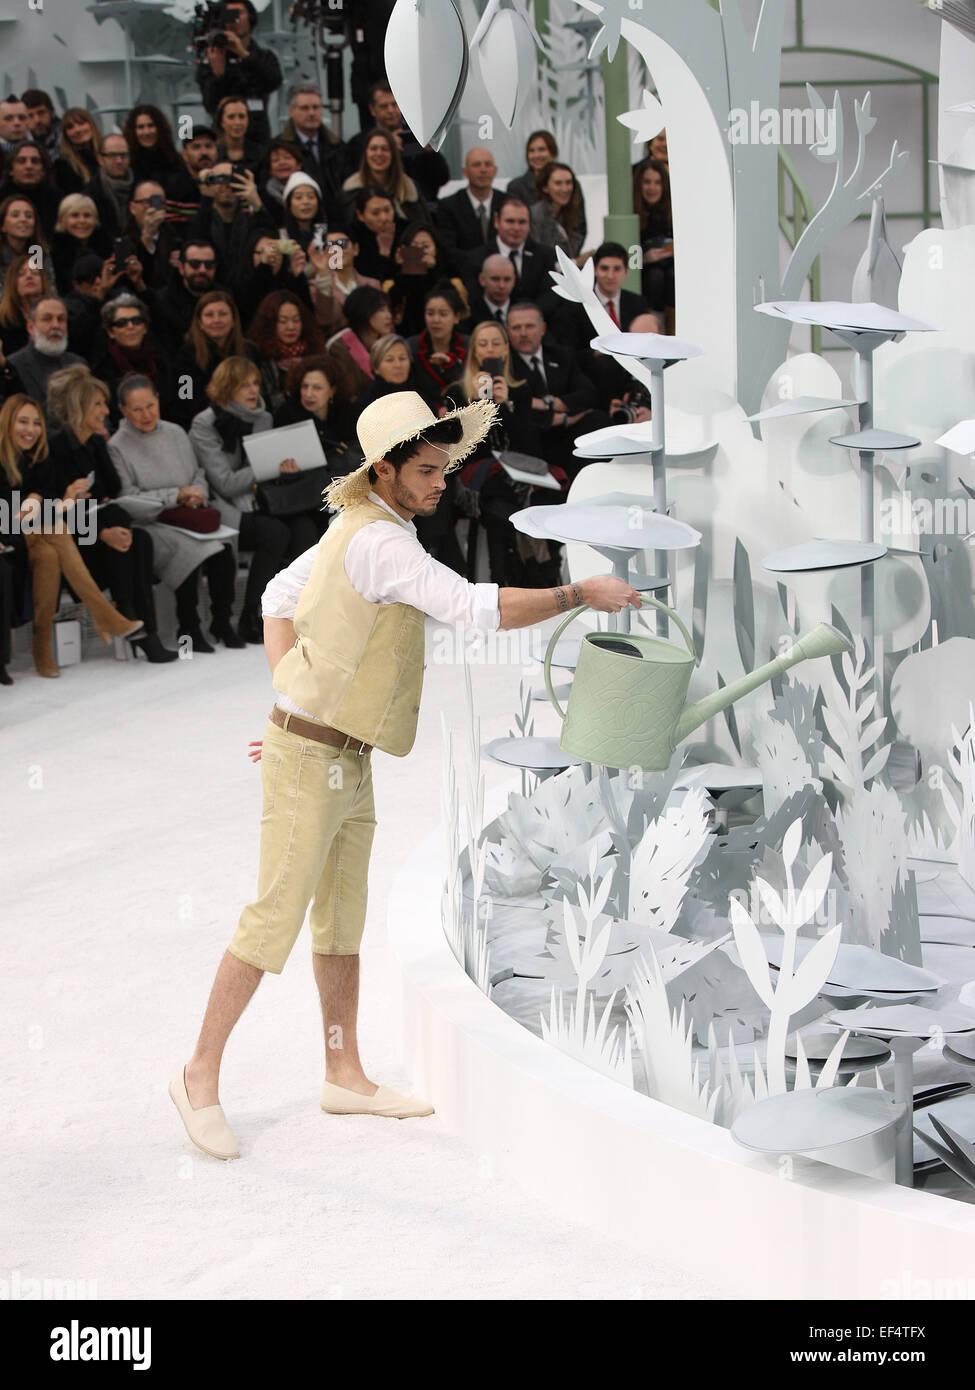 Baptiste Giabiconi Chanel Fashion Show Imágenes De Stock & Baptiste ...